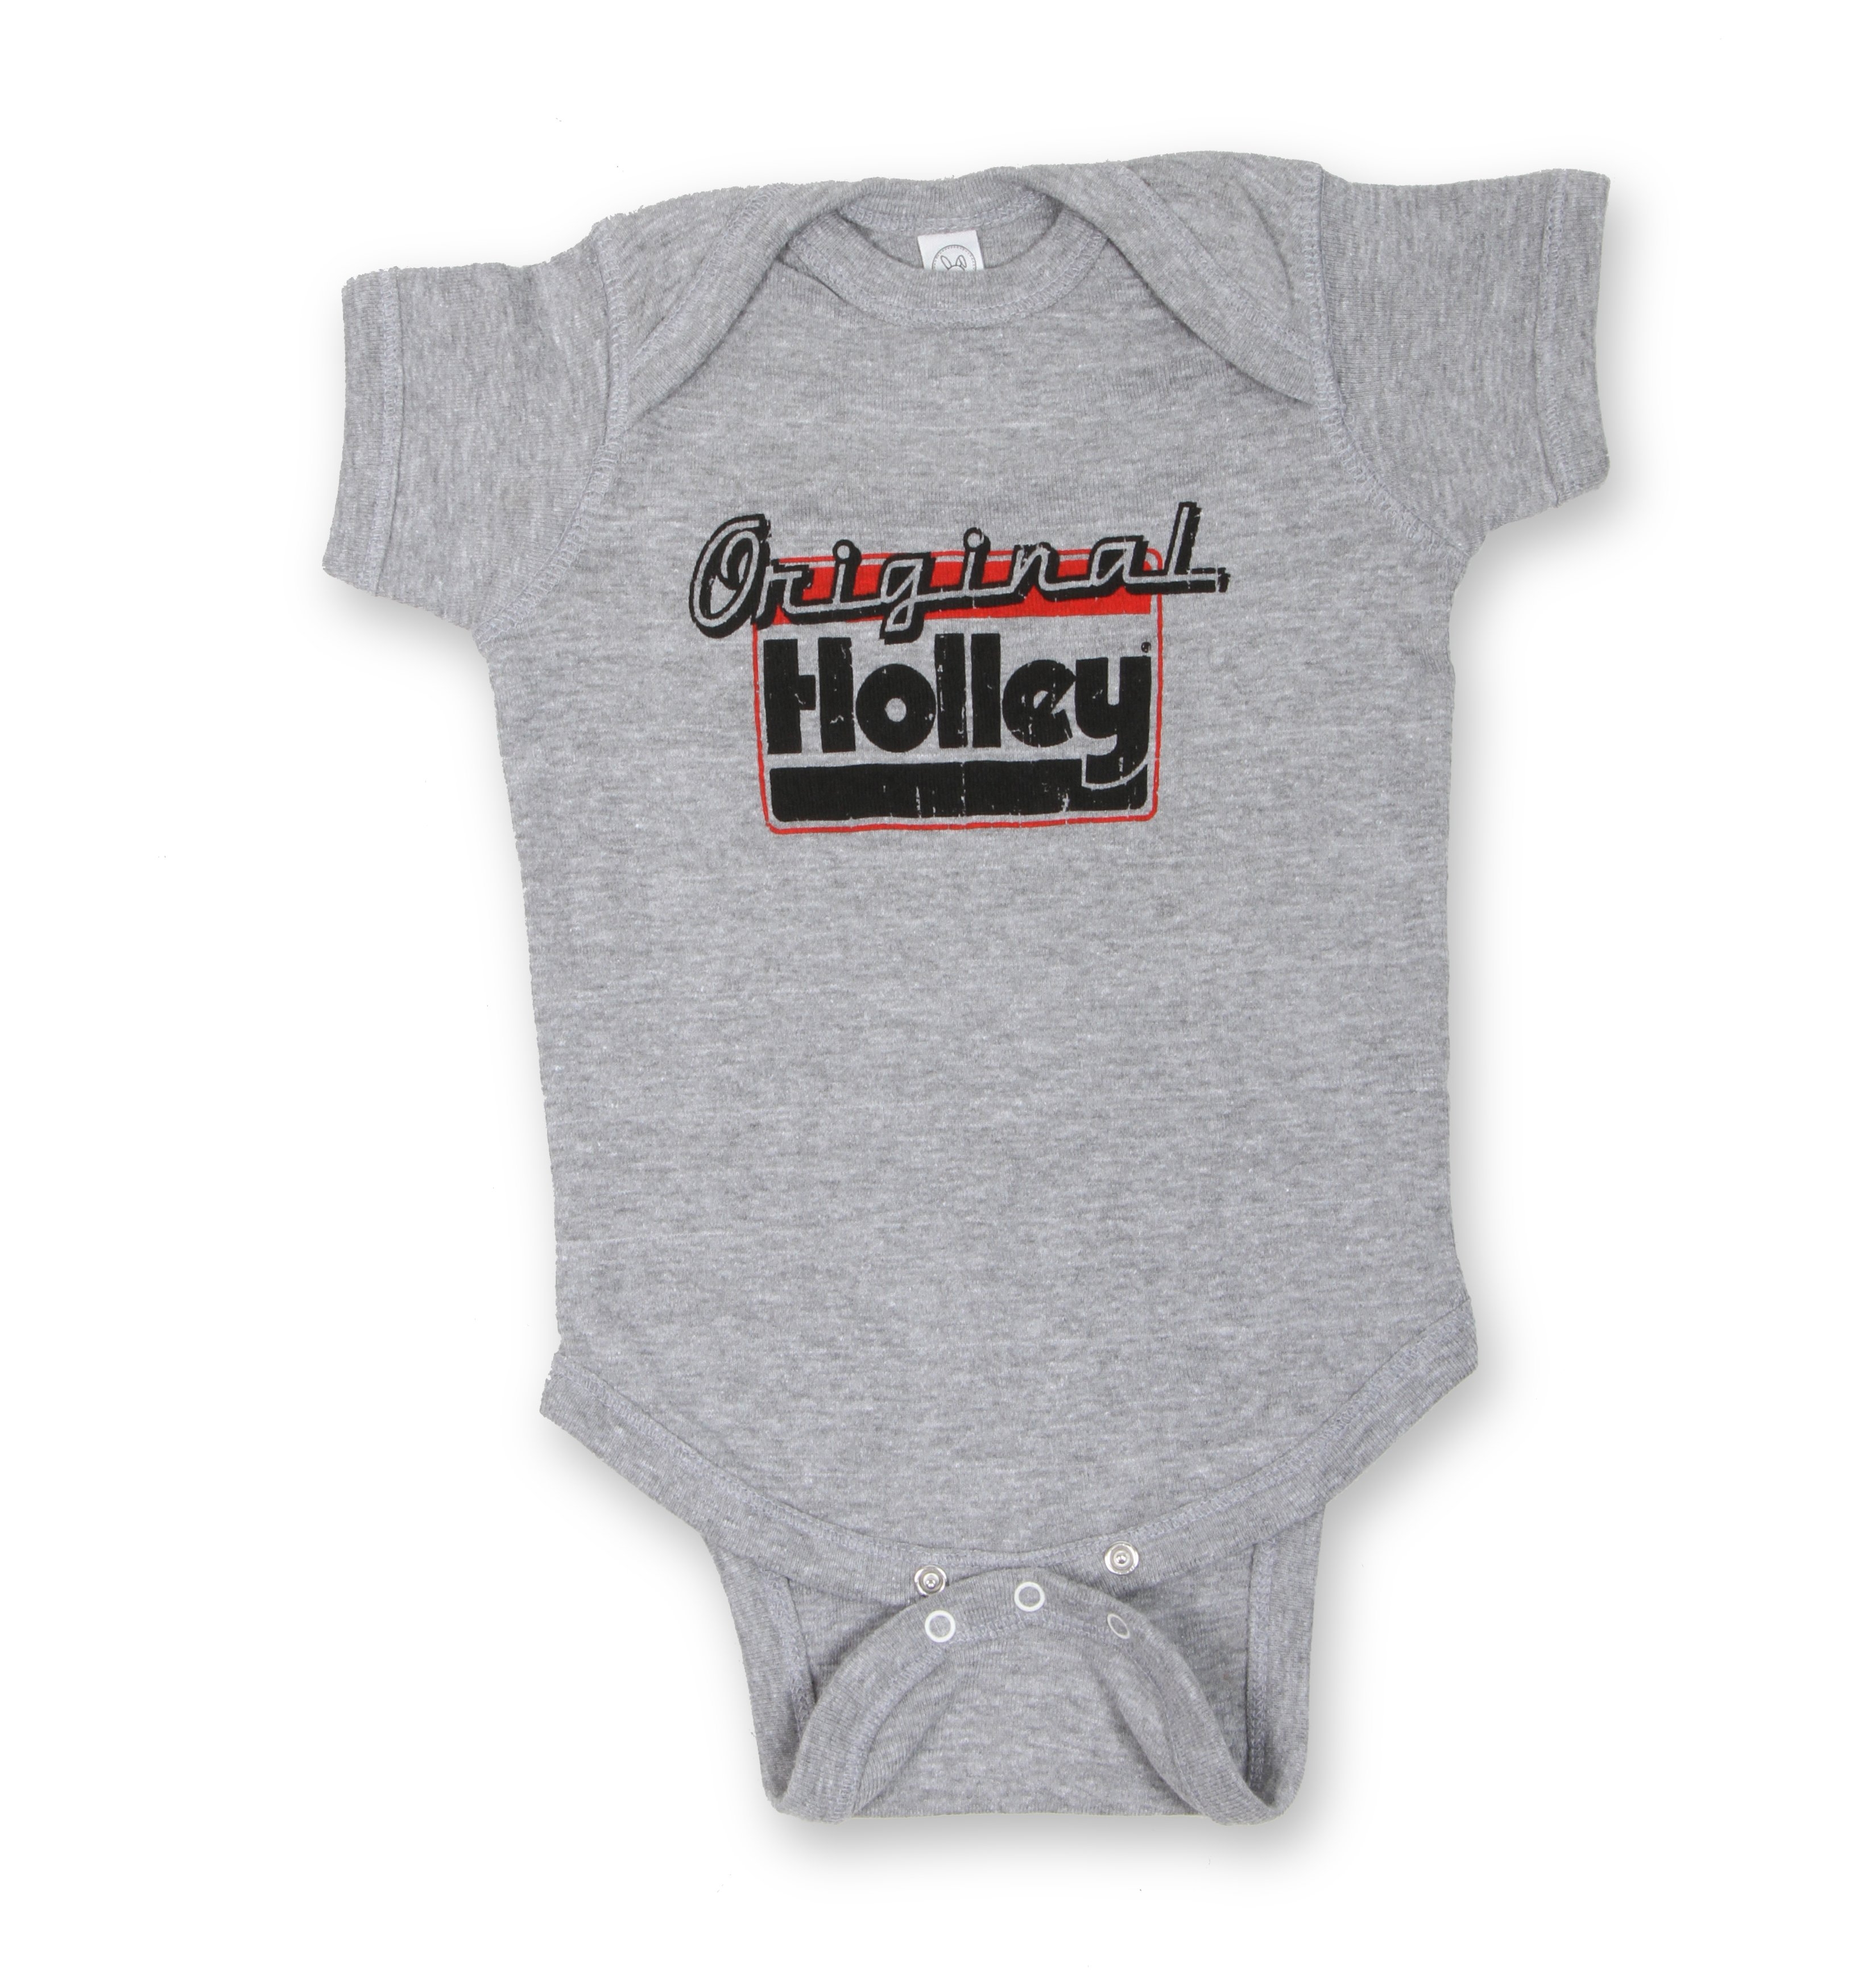 b9c68ed17 10107-1ZHOL - Original Holley Vintage Baby Bodysuit Image